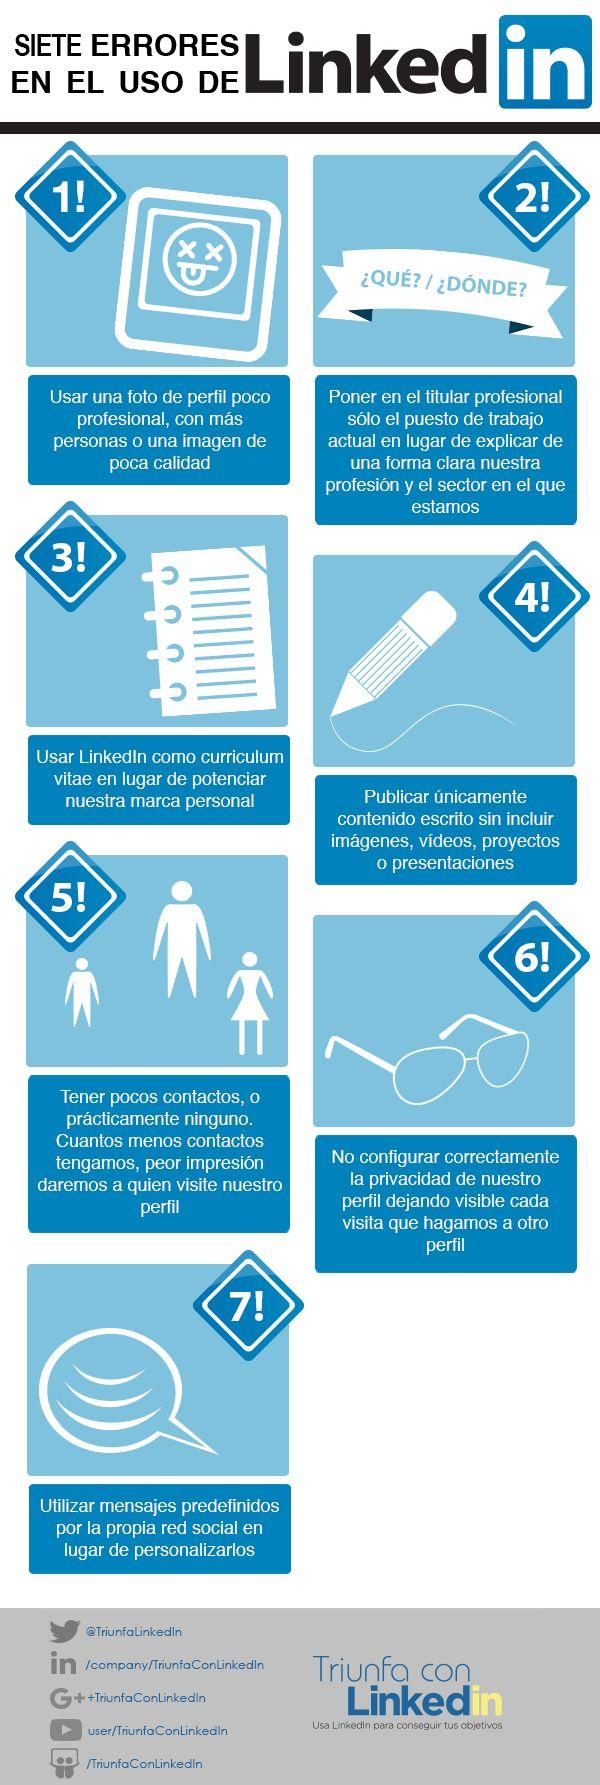 91 best Consejos LinkedIn images on Pinterest   Conseguir, Algun y ...